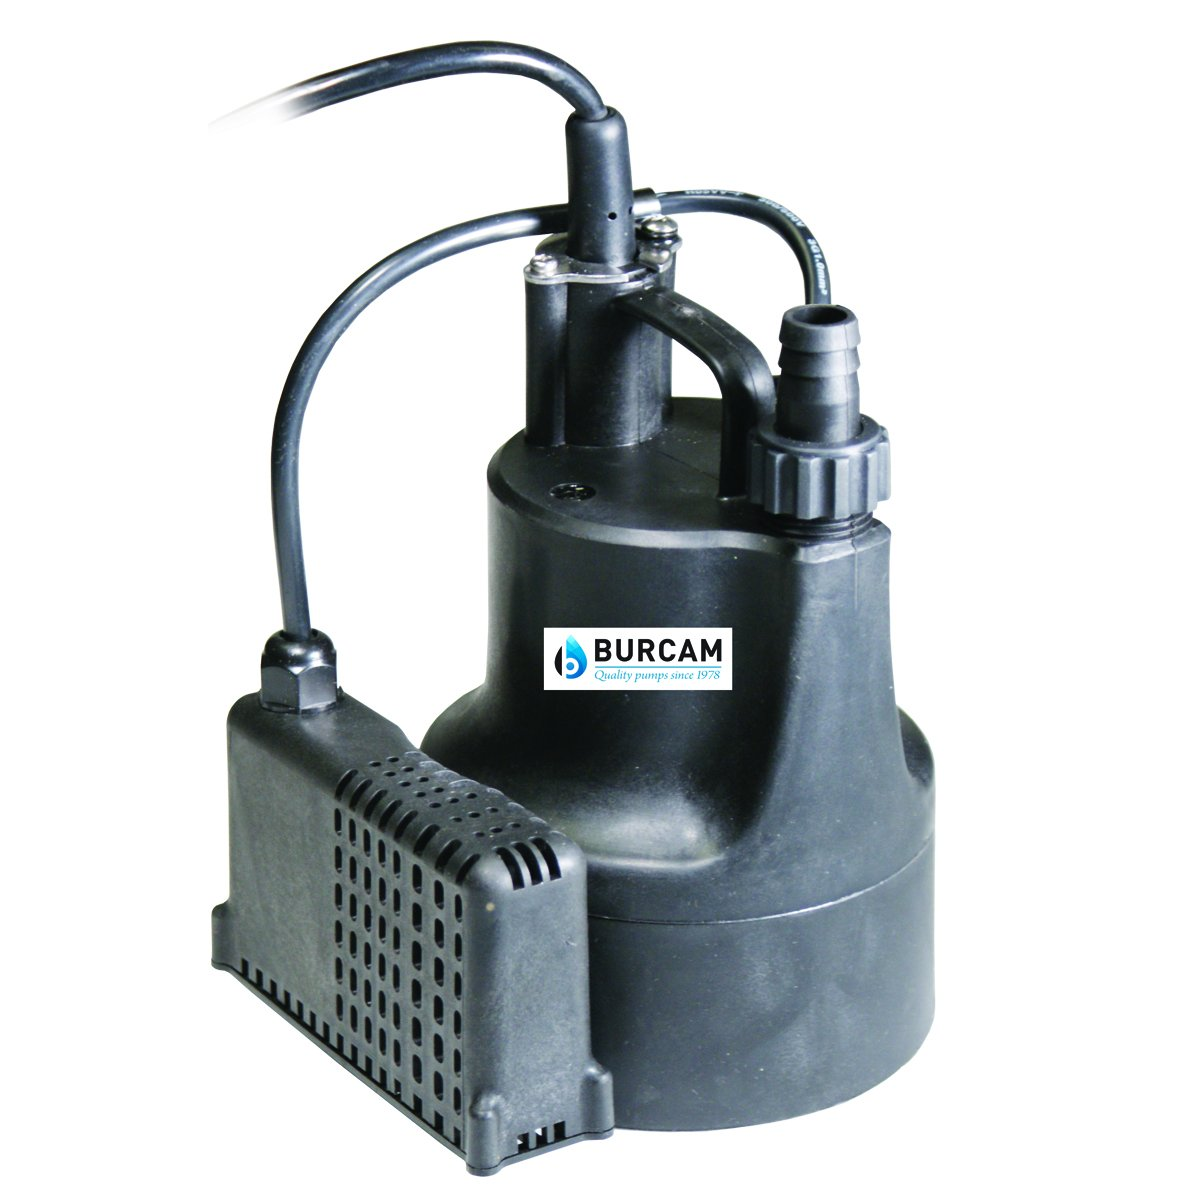 BURCAM 300506S 1/6 HP Automatic Dewatering Utility Pump, Black by Bur-Cam